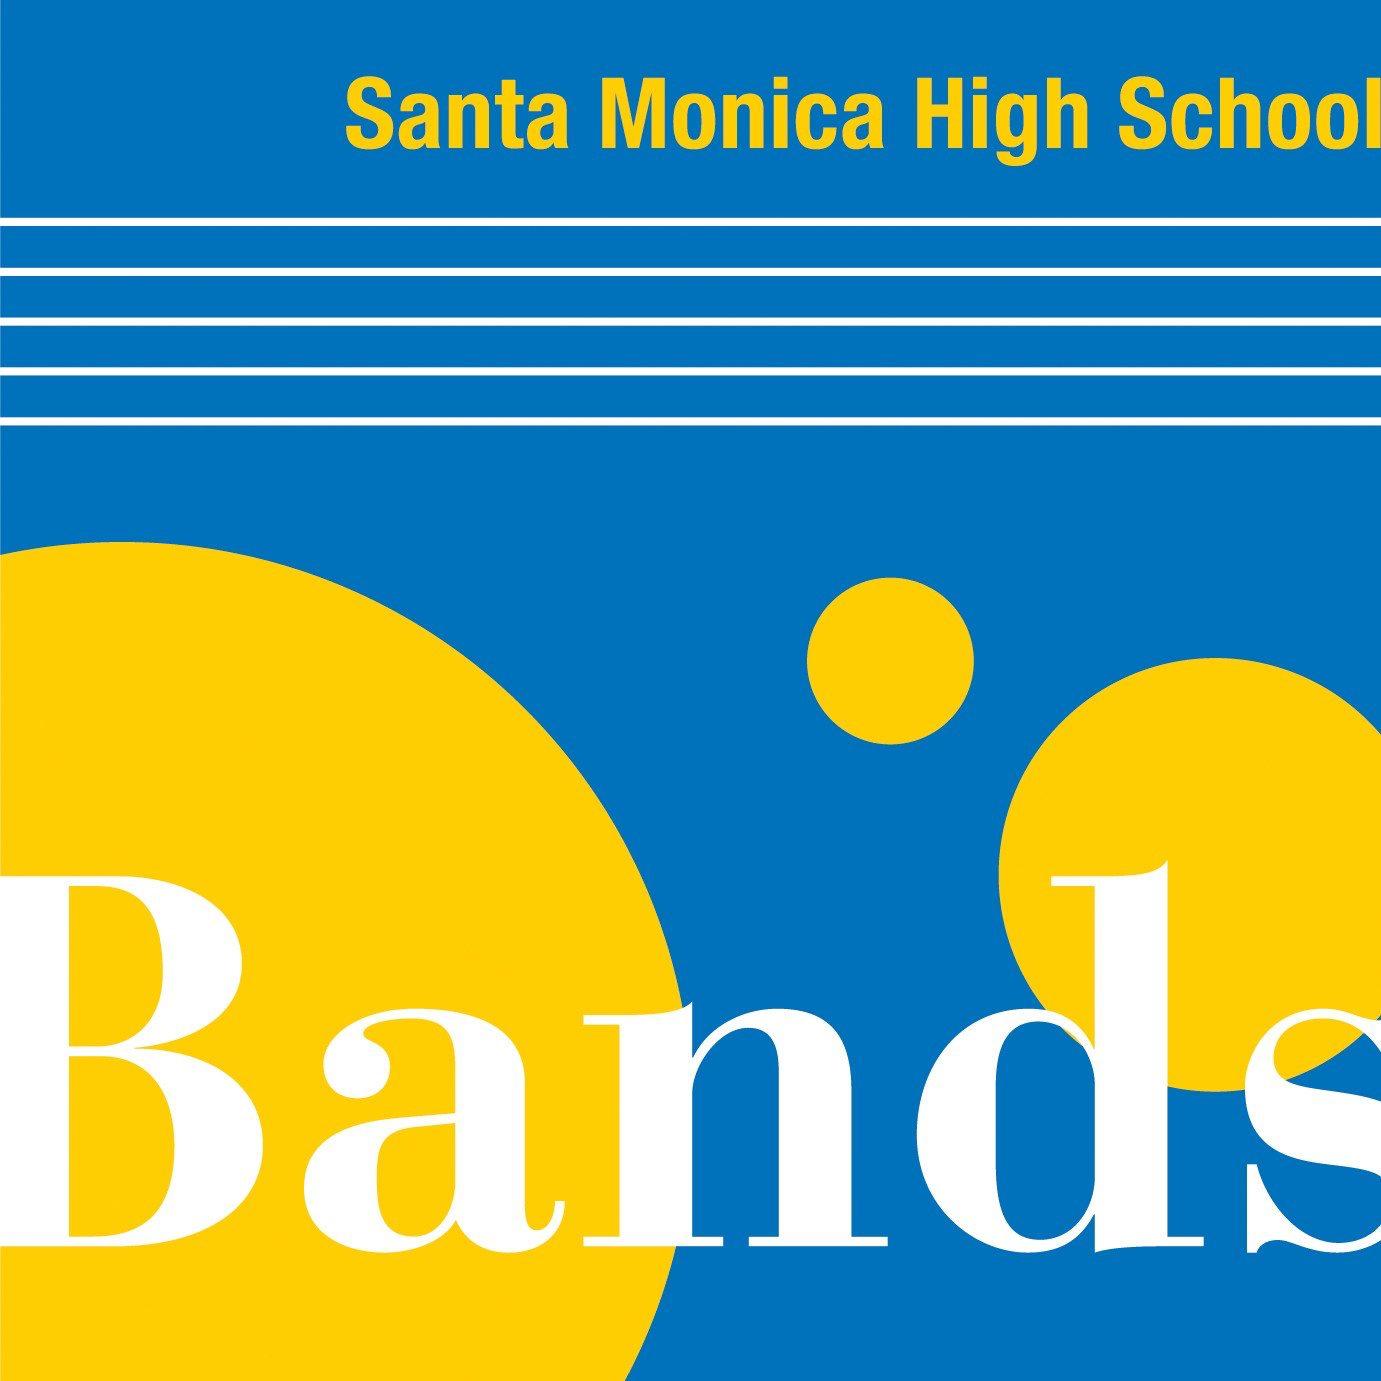 Santa Monica High School Bands